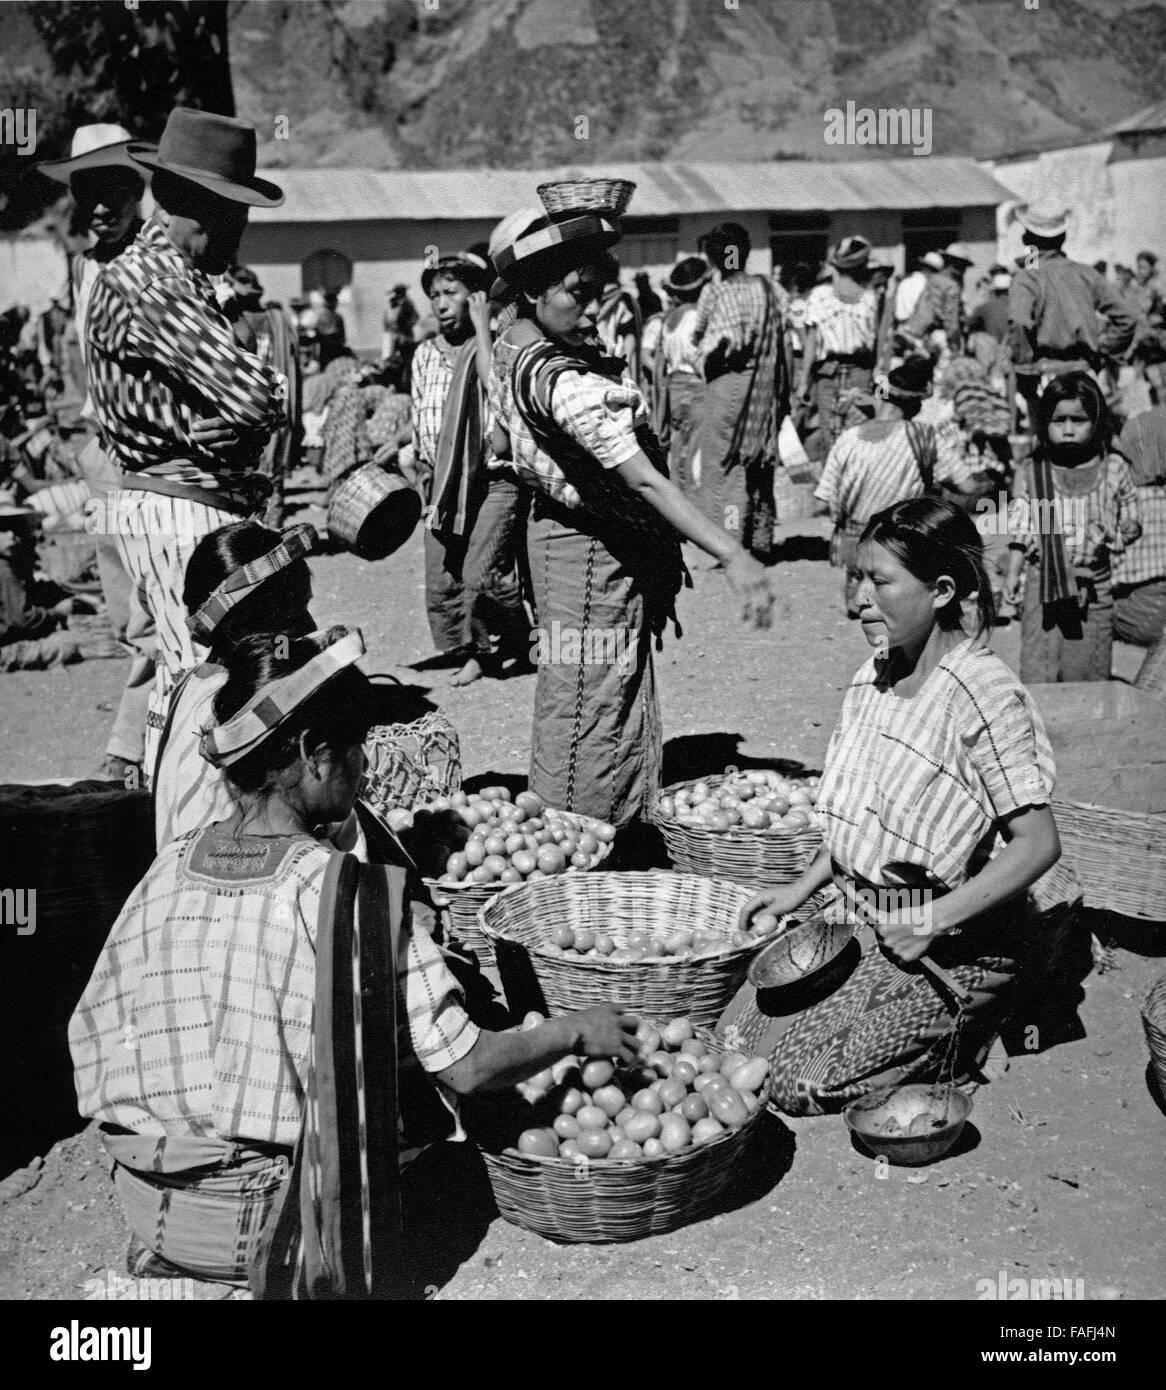 Männer auf dem Markt in Santiago Atitlan, Guatemala 1970er Jahre. People at Santiago Atitlan market, Guatemala - Stock Image